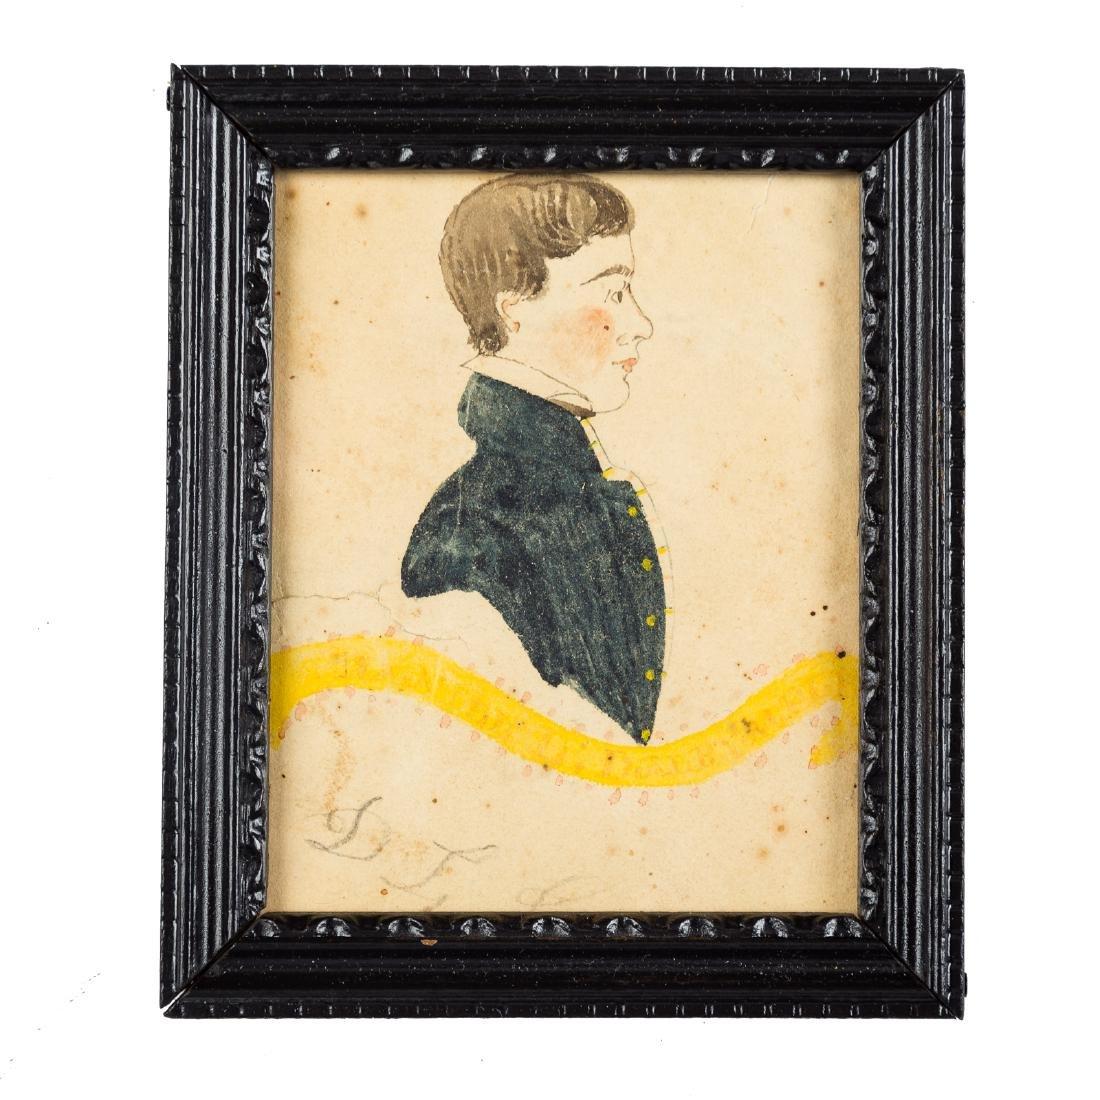 American School 19th century portrait miniature